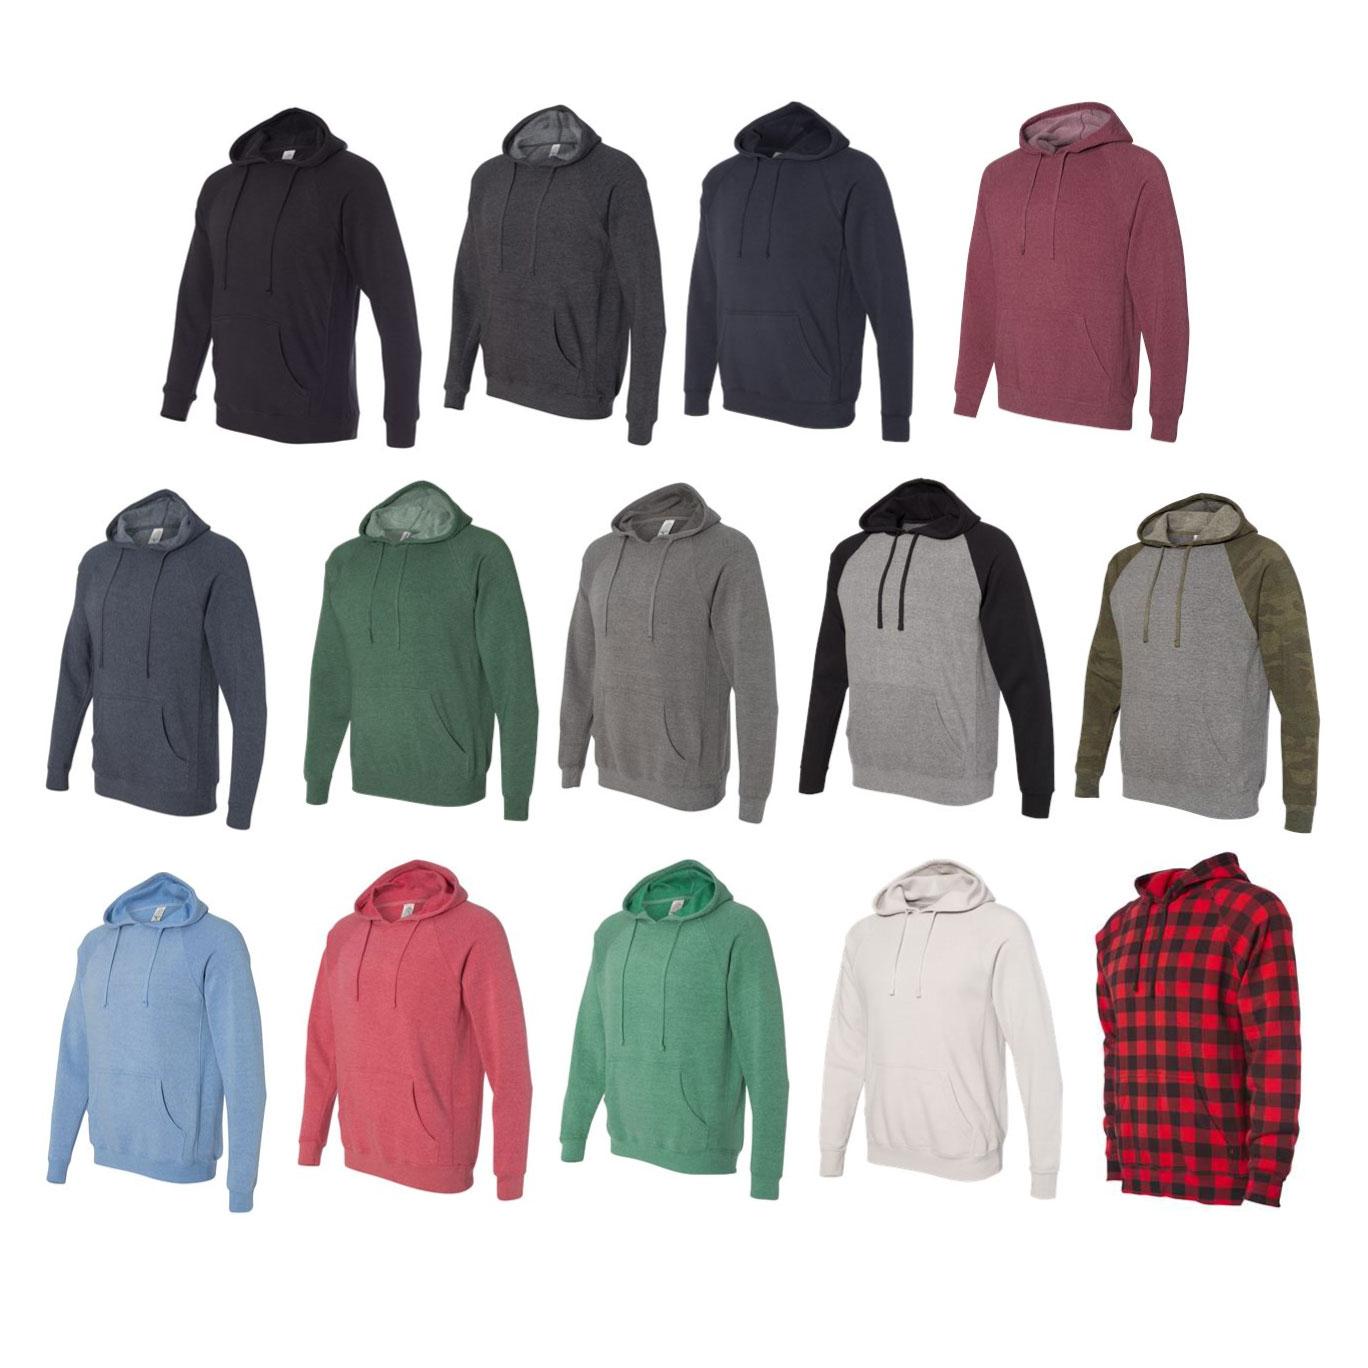 Independent Trading Co. - Unisex Special Blend Raglan Hooded Sweatshirt